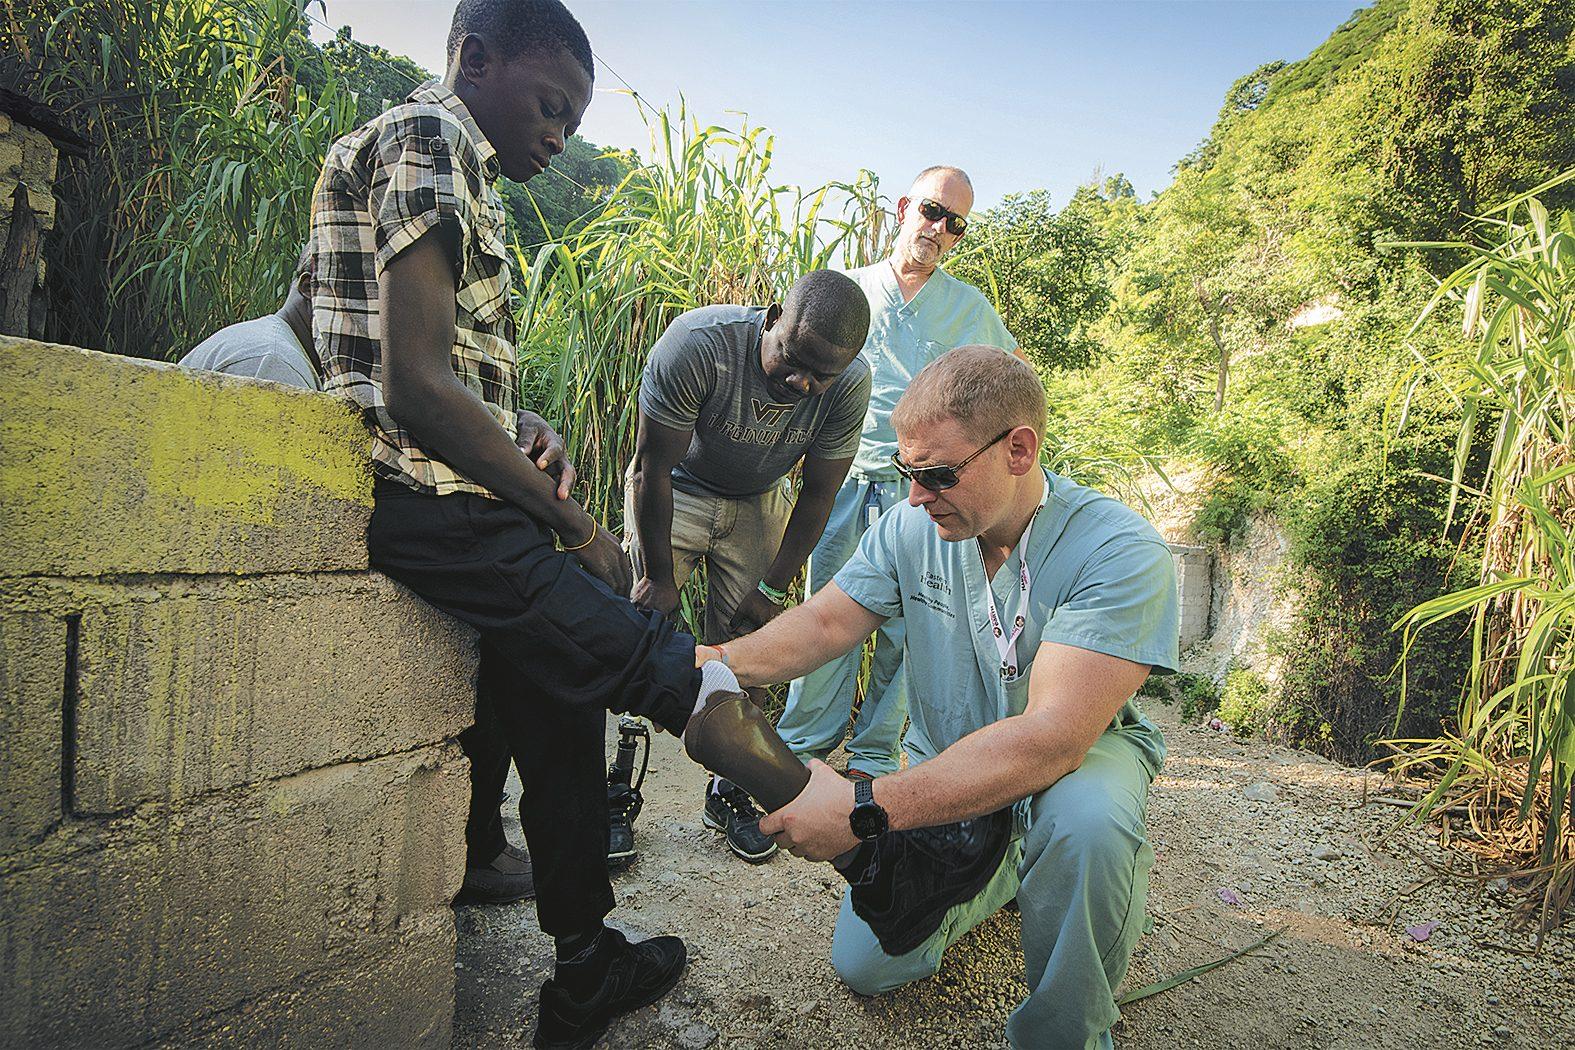 Dr. Andrew Furey examining a patient in Haiti